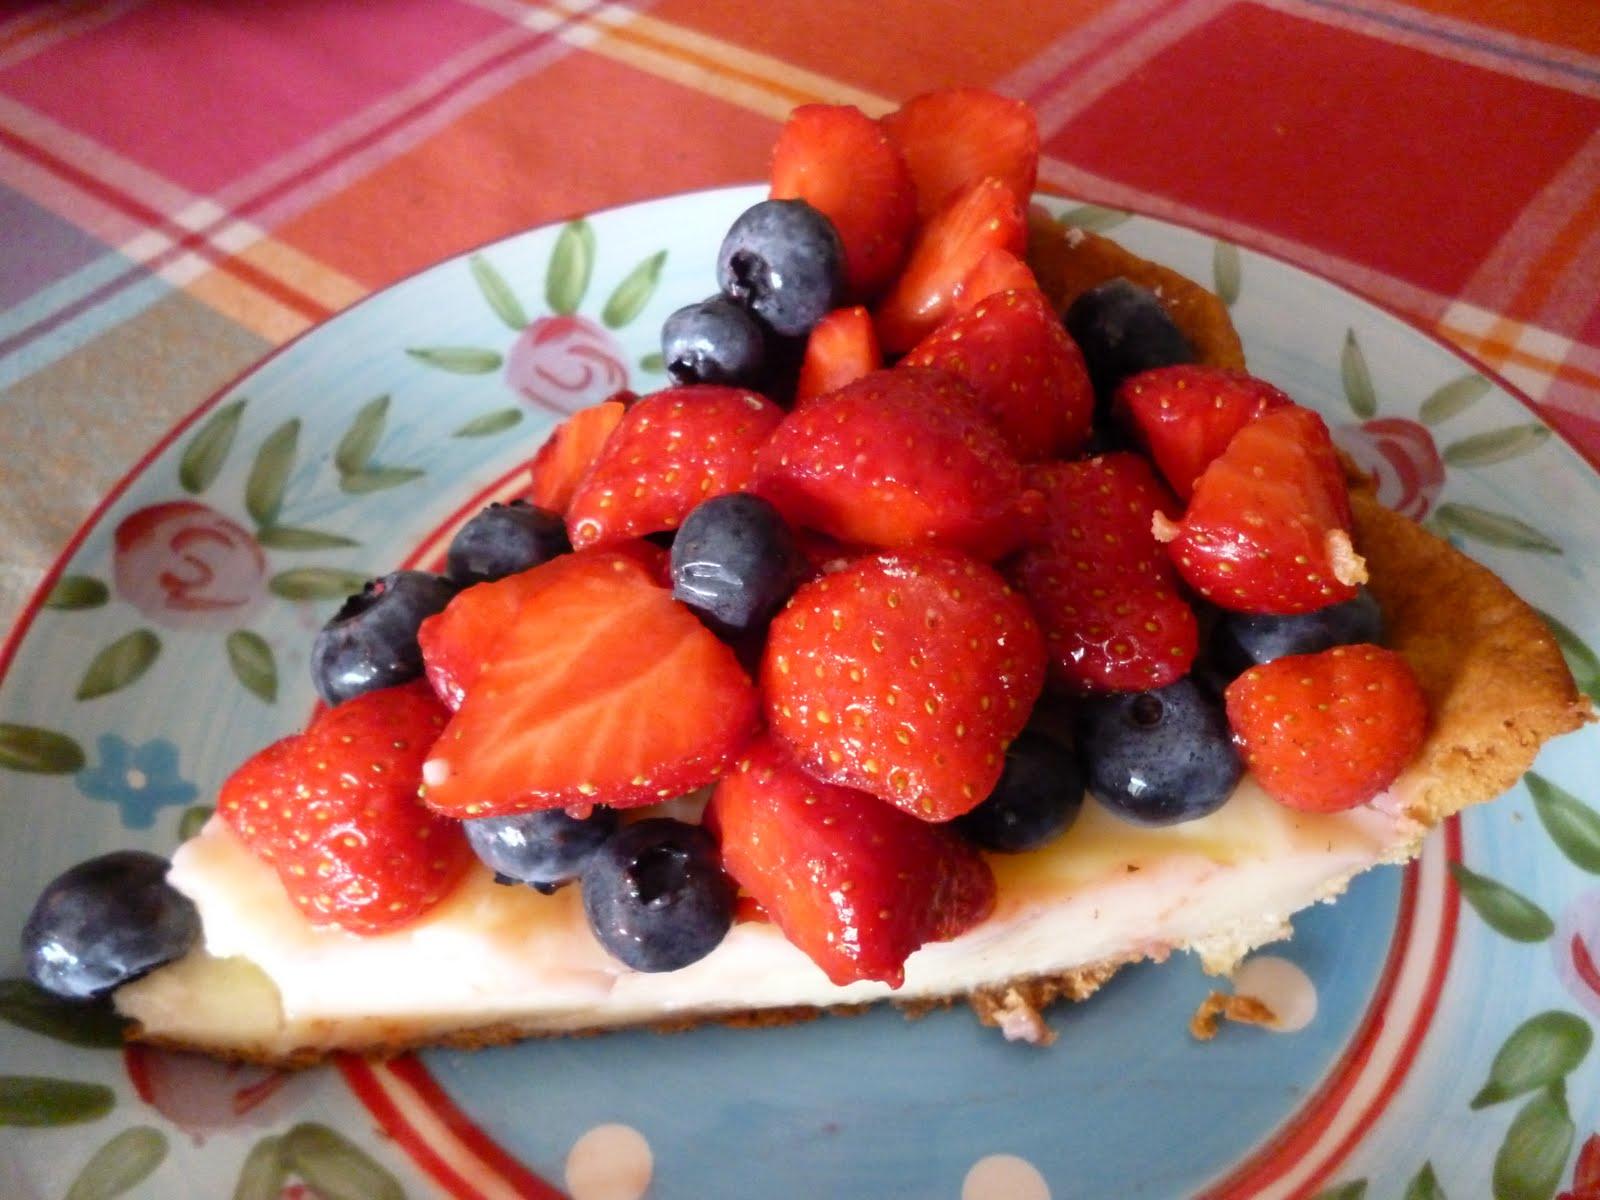 Anne in de keuken: aardbeien blauwe bessen taart